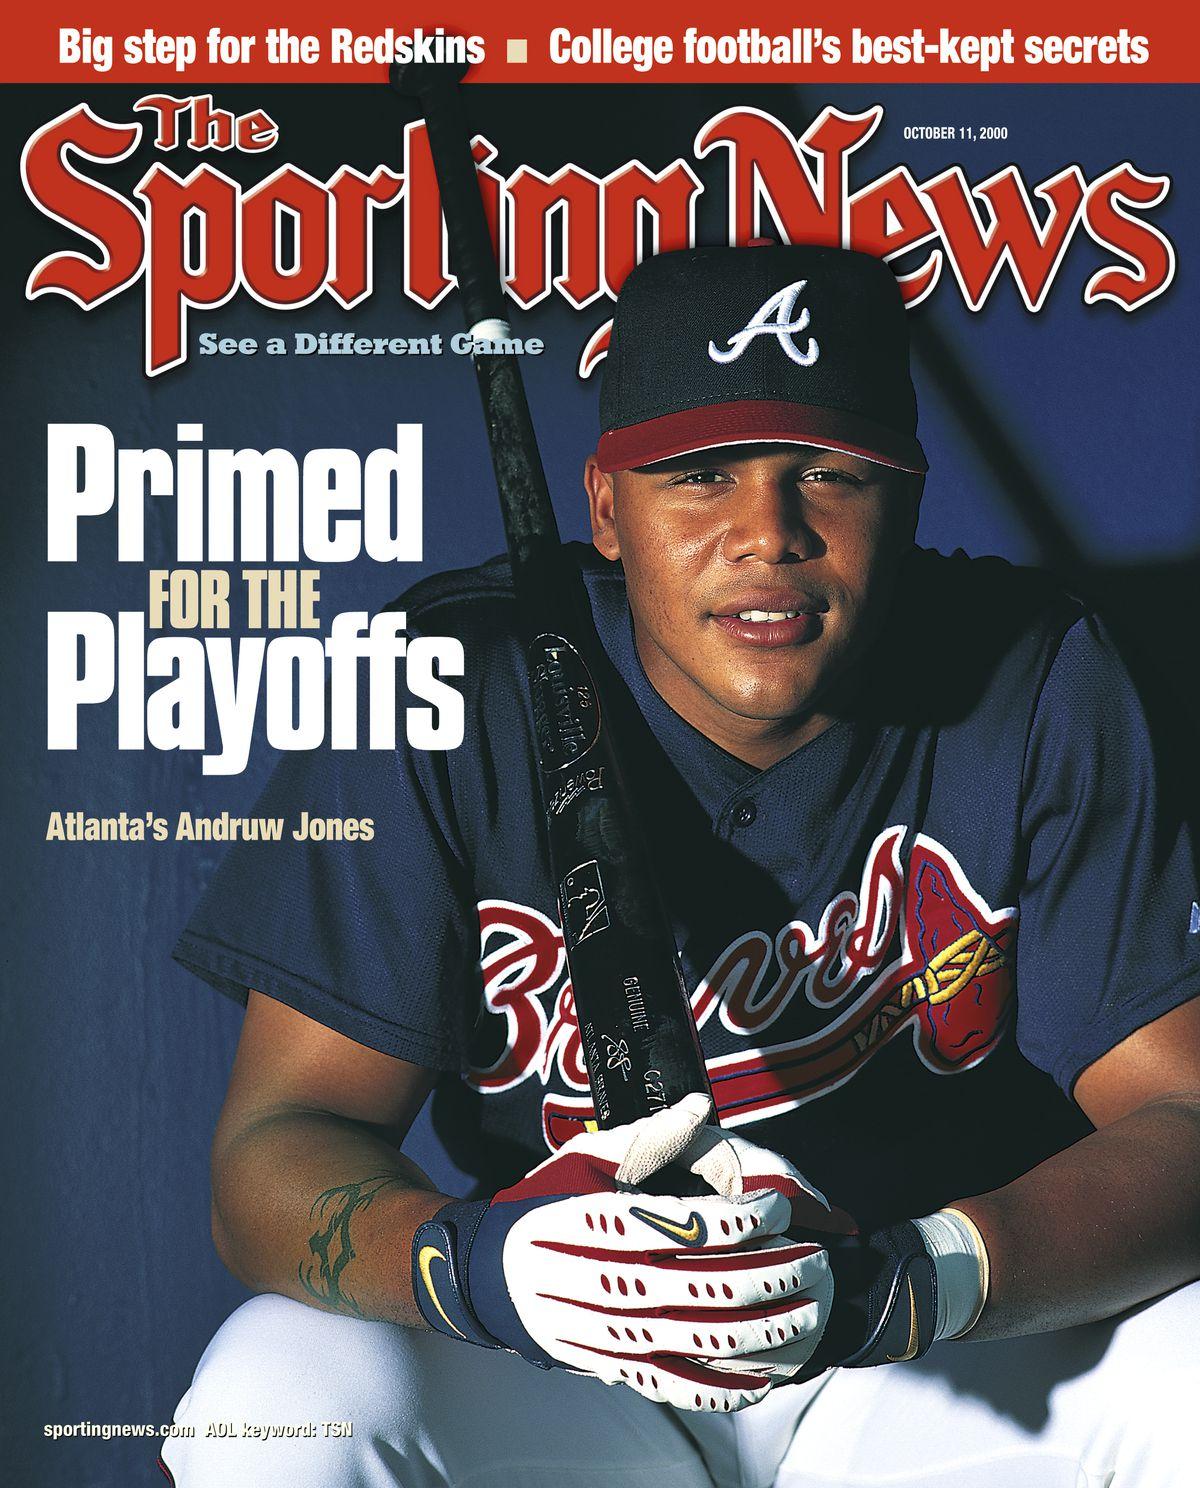 MLB Covers - Atlanta Braves OF Andruw Jones - October 9, 2000